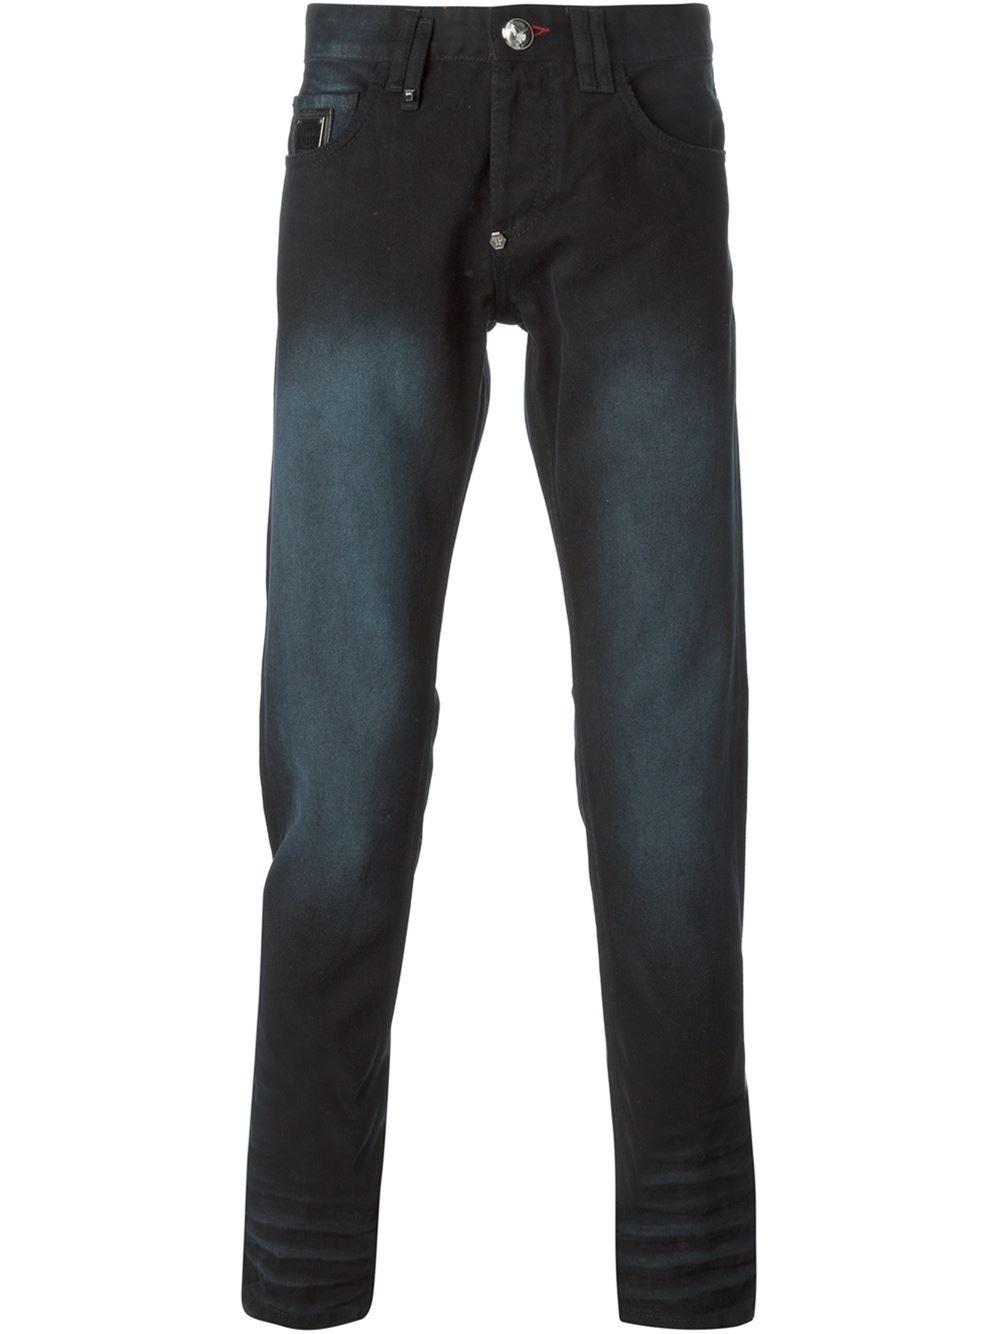 philipp plein slim fit jeans in black for men lyst. Black Bedroom Furniture Sets. Home Design Ideas